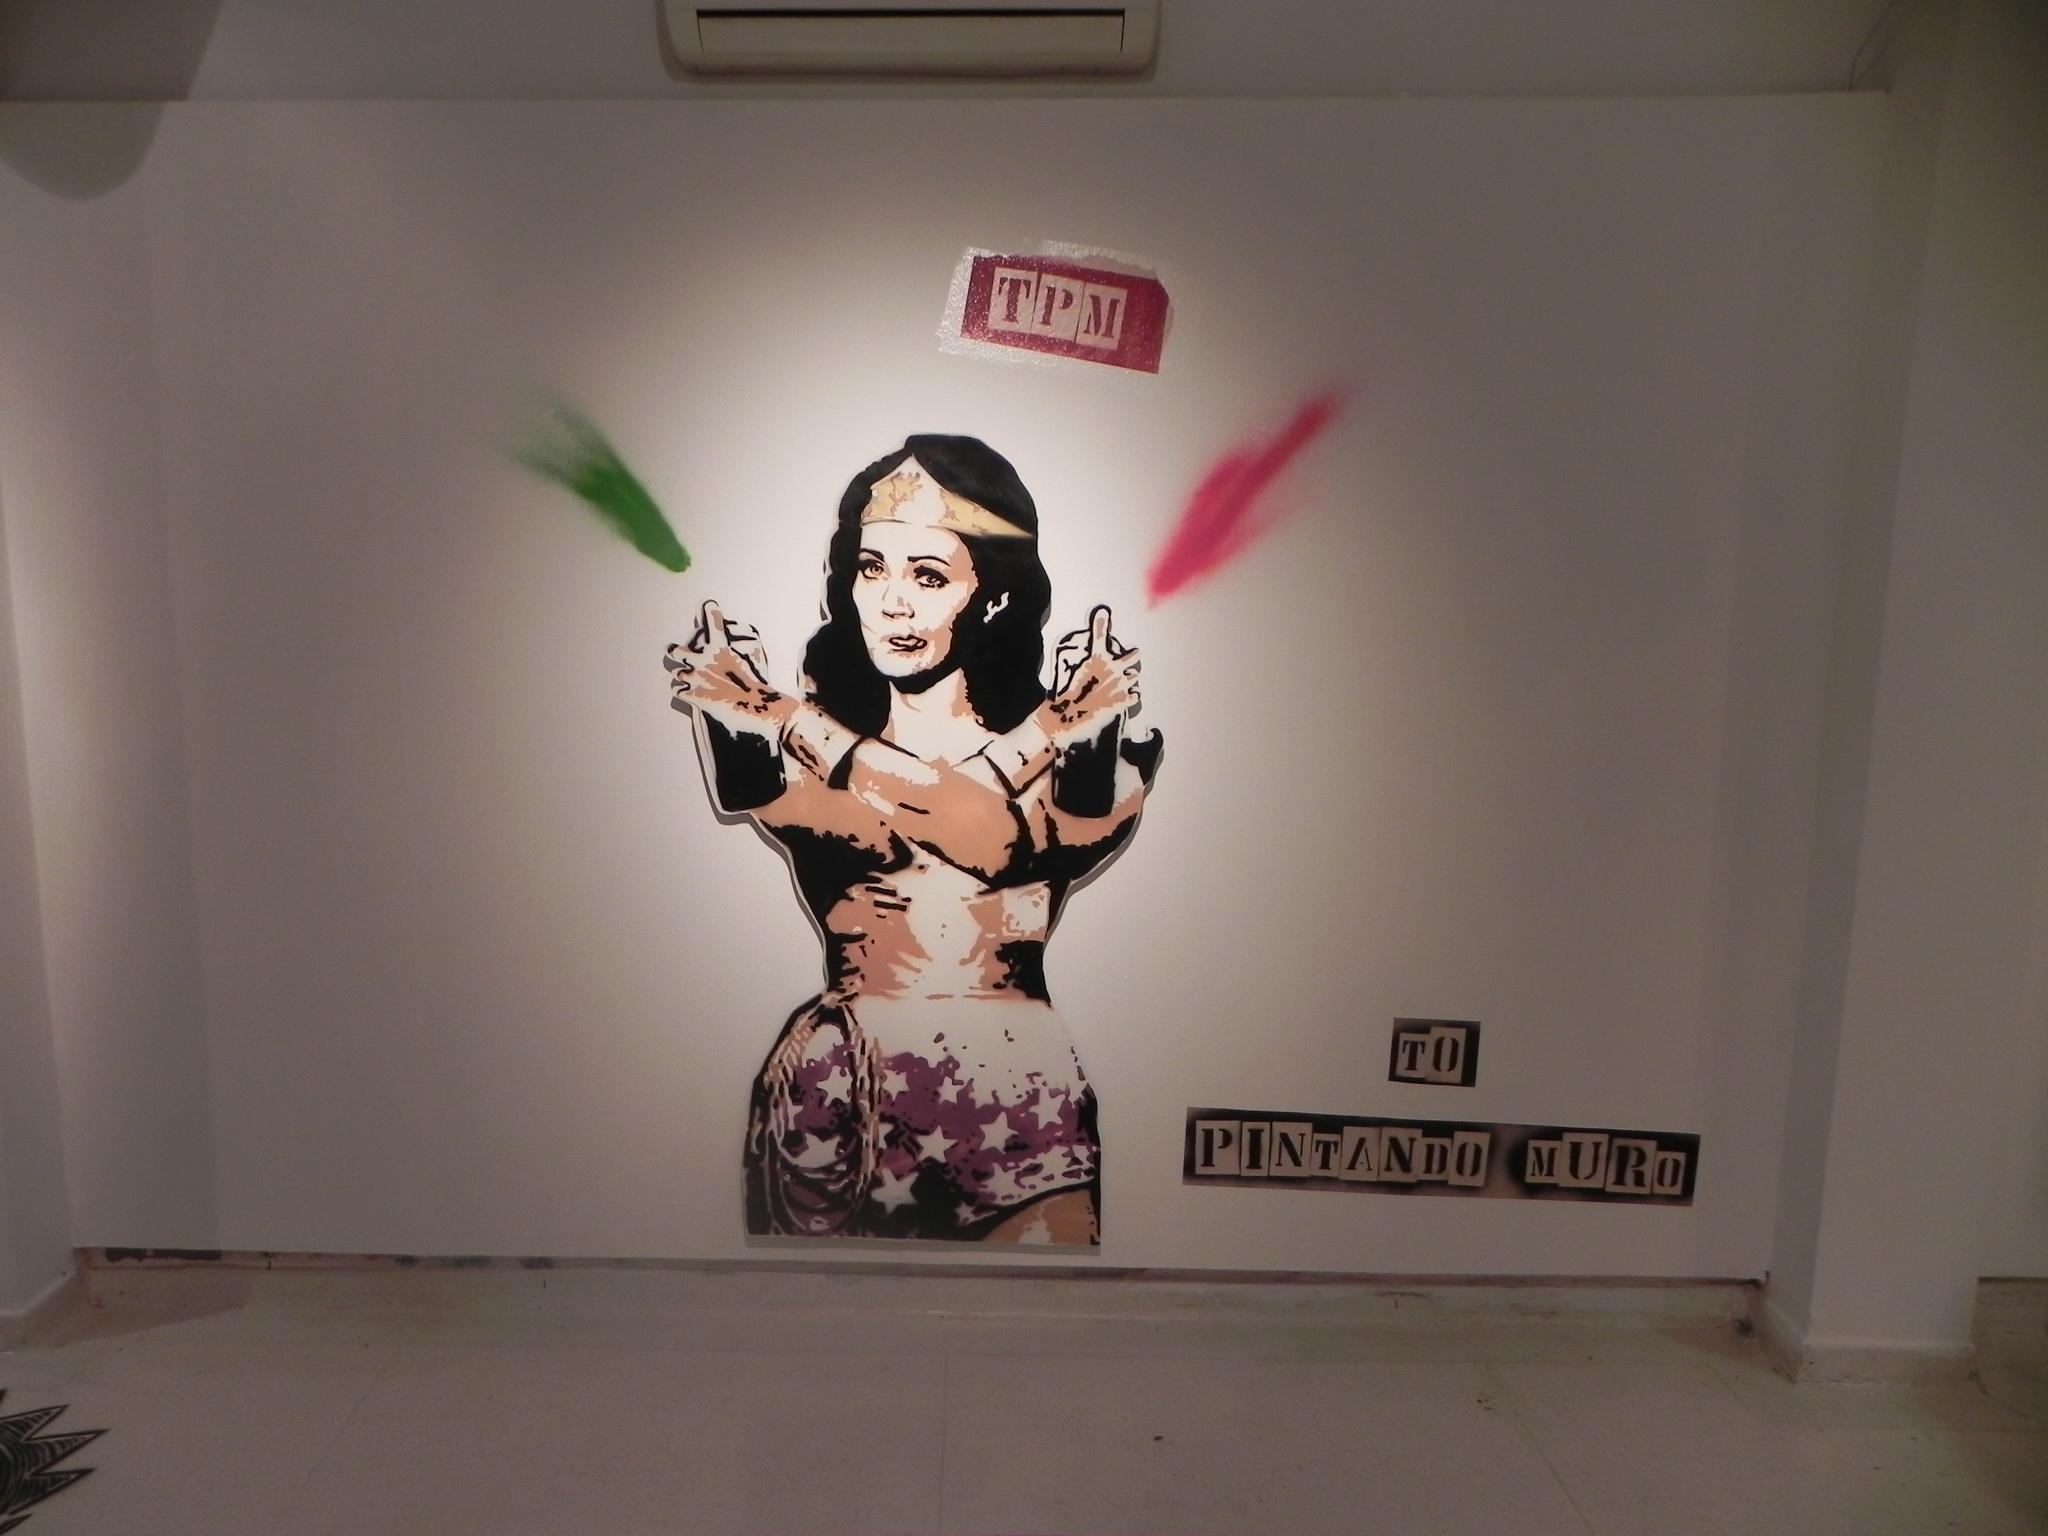 TPM Tô Pintando Muro